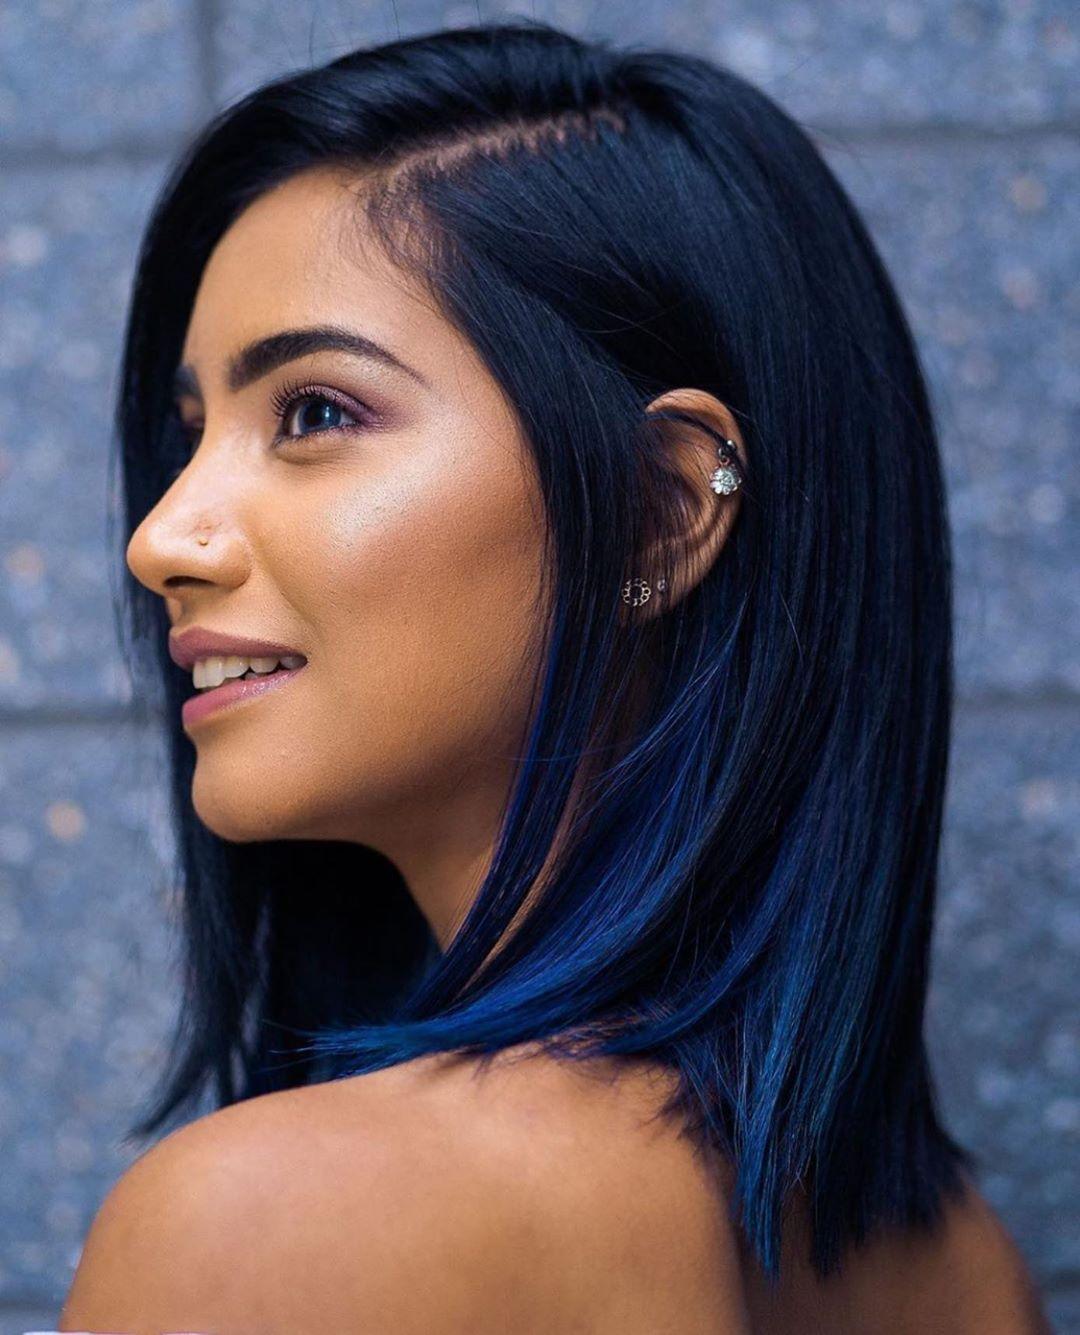 30 hair ideas for medium length hair in 2020 spring hair